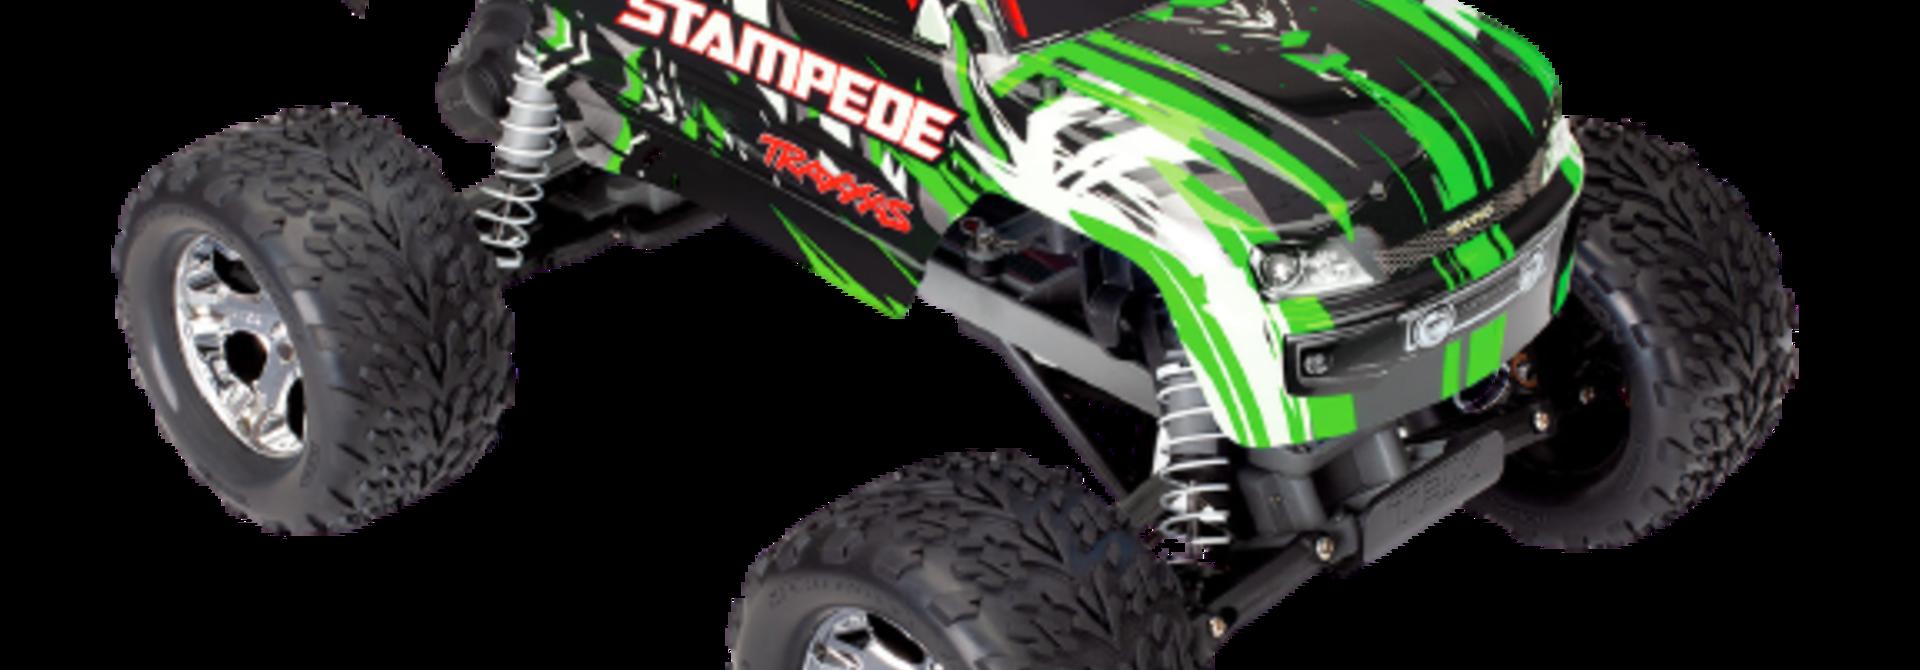 Traxxas Stampede XL-5 TQ (incl battery/charger), Green TRX36054-1G